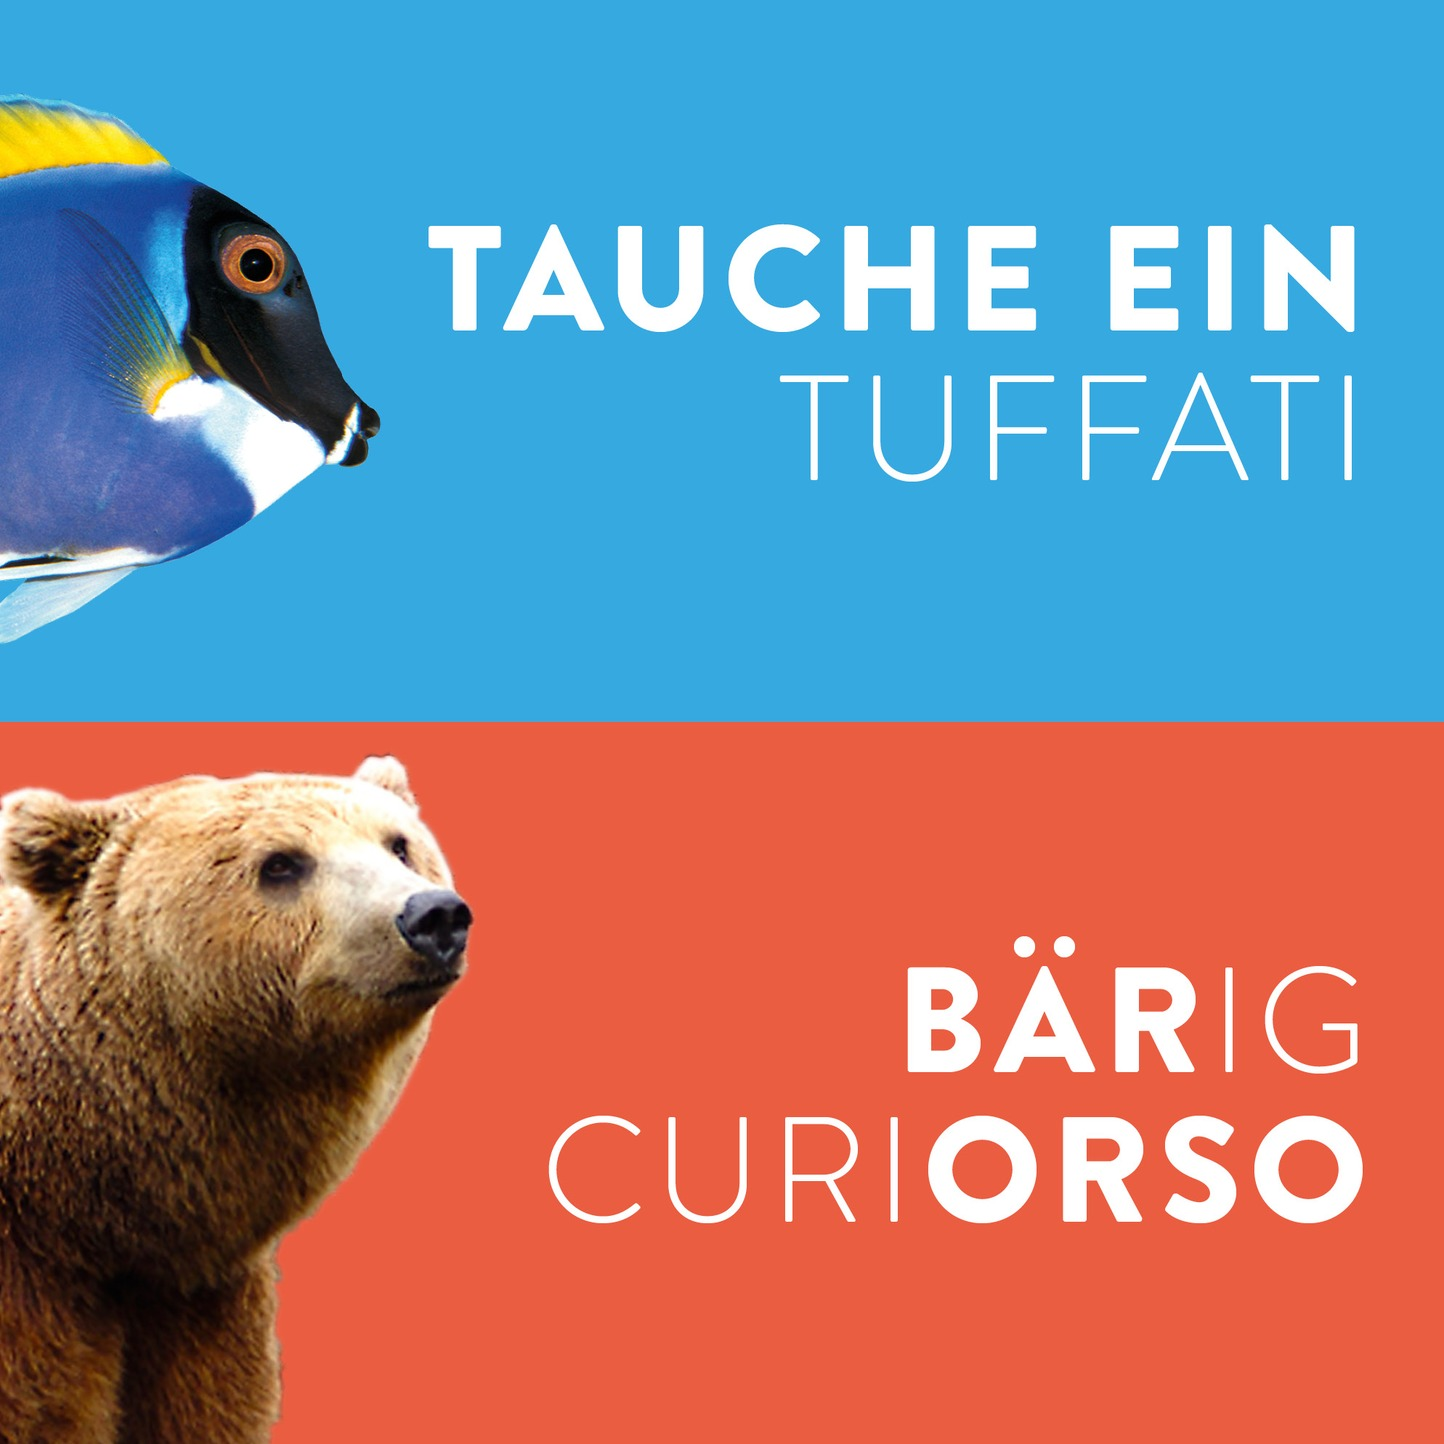 Museo / Museum branding